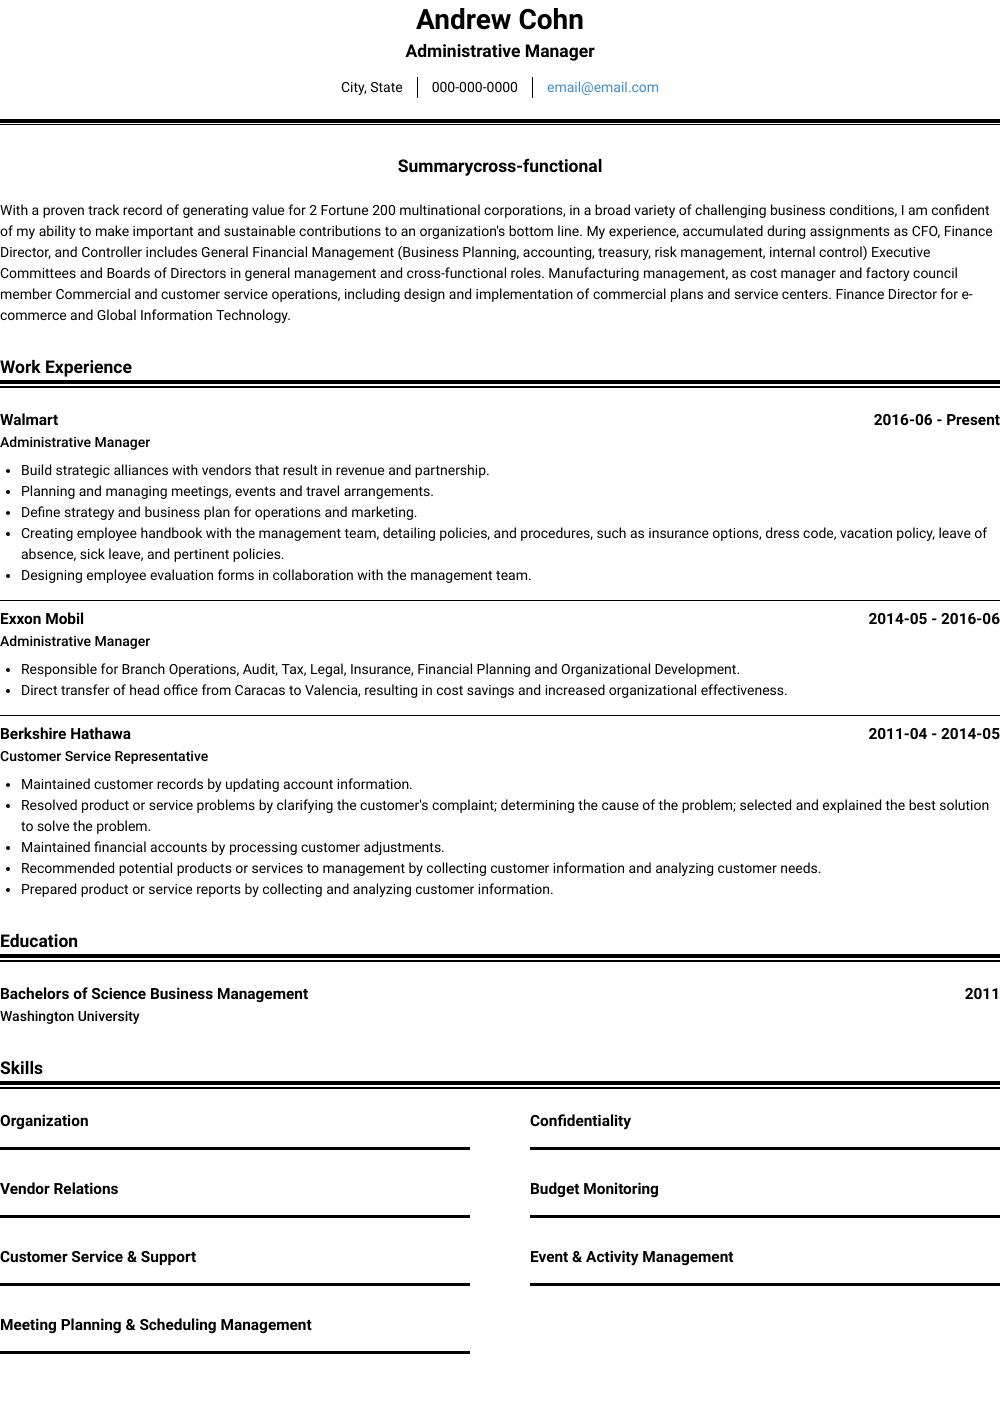 resume examples builder